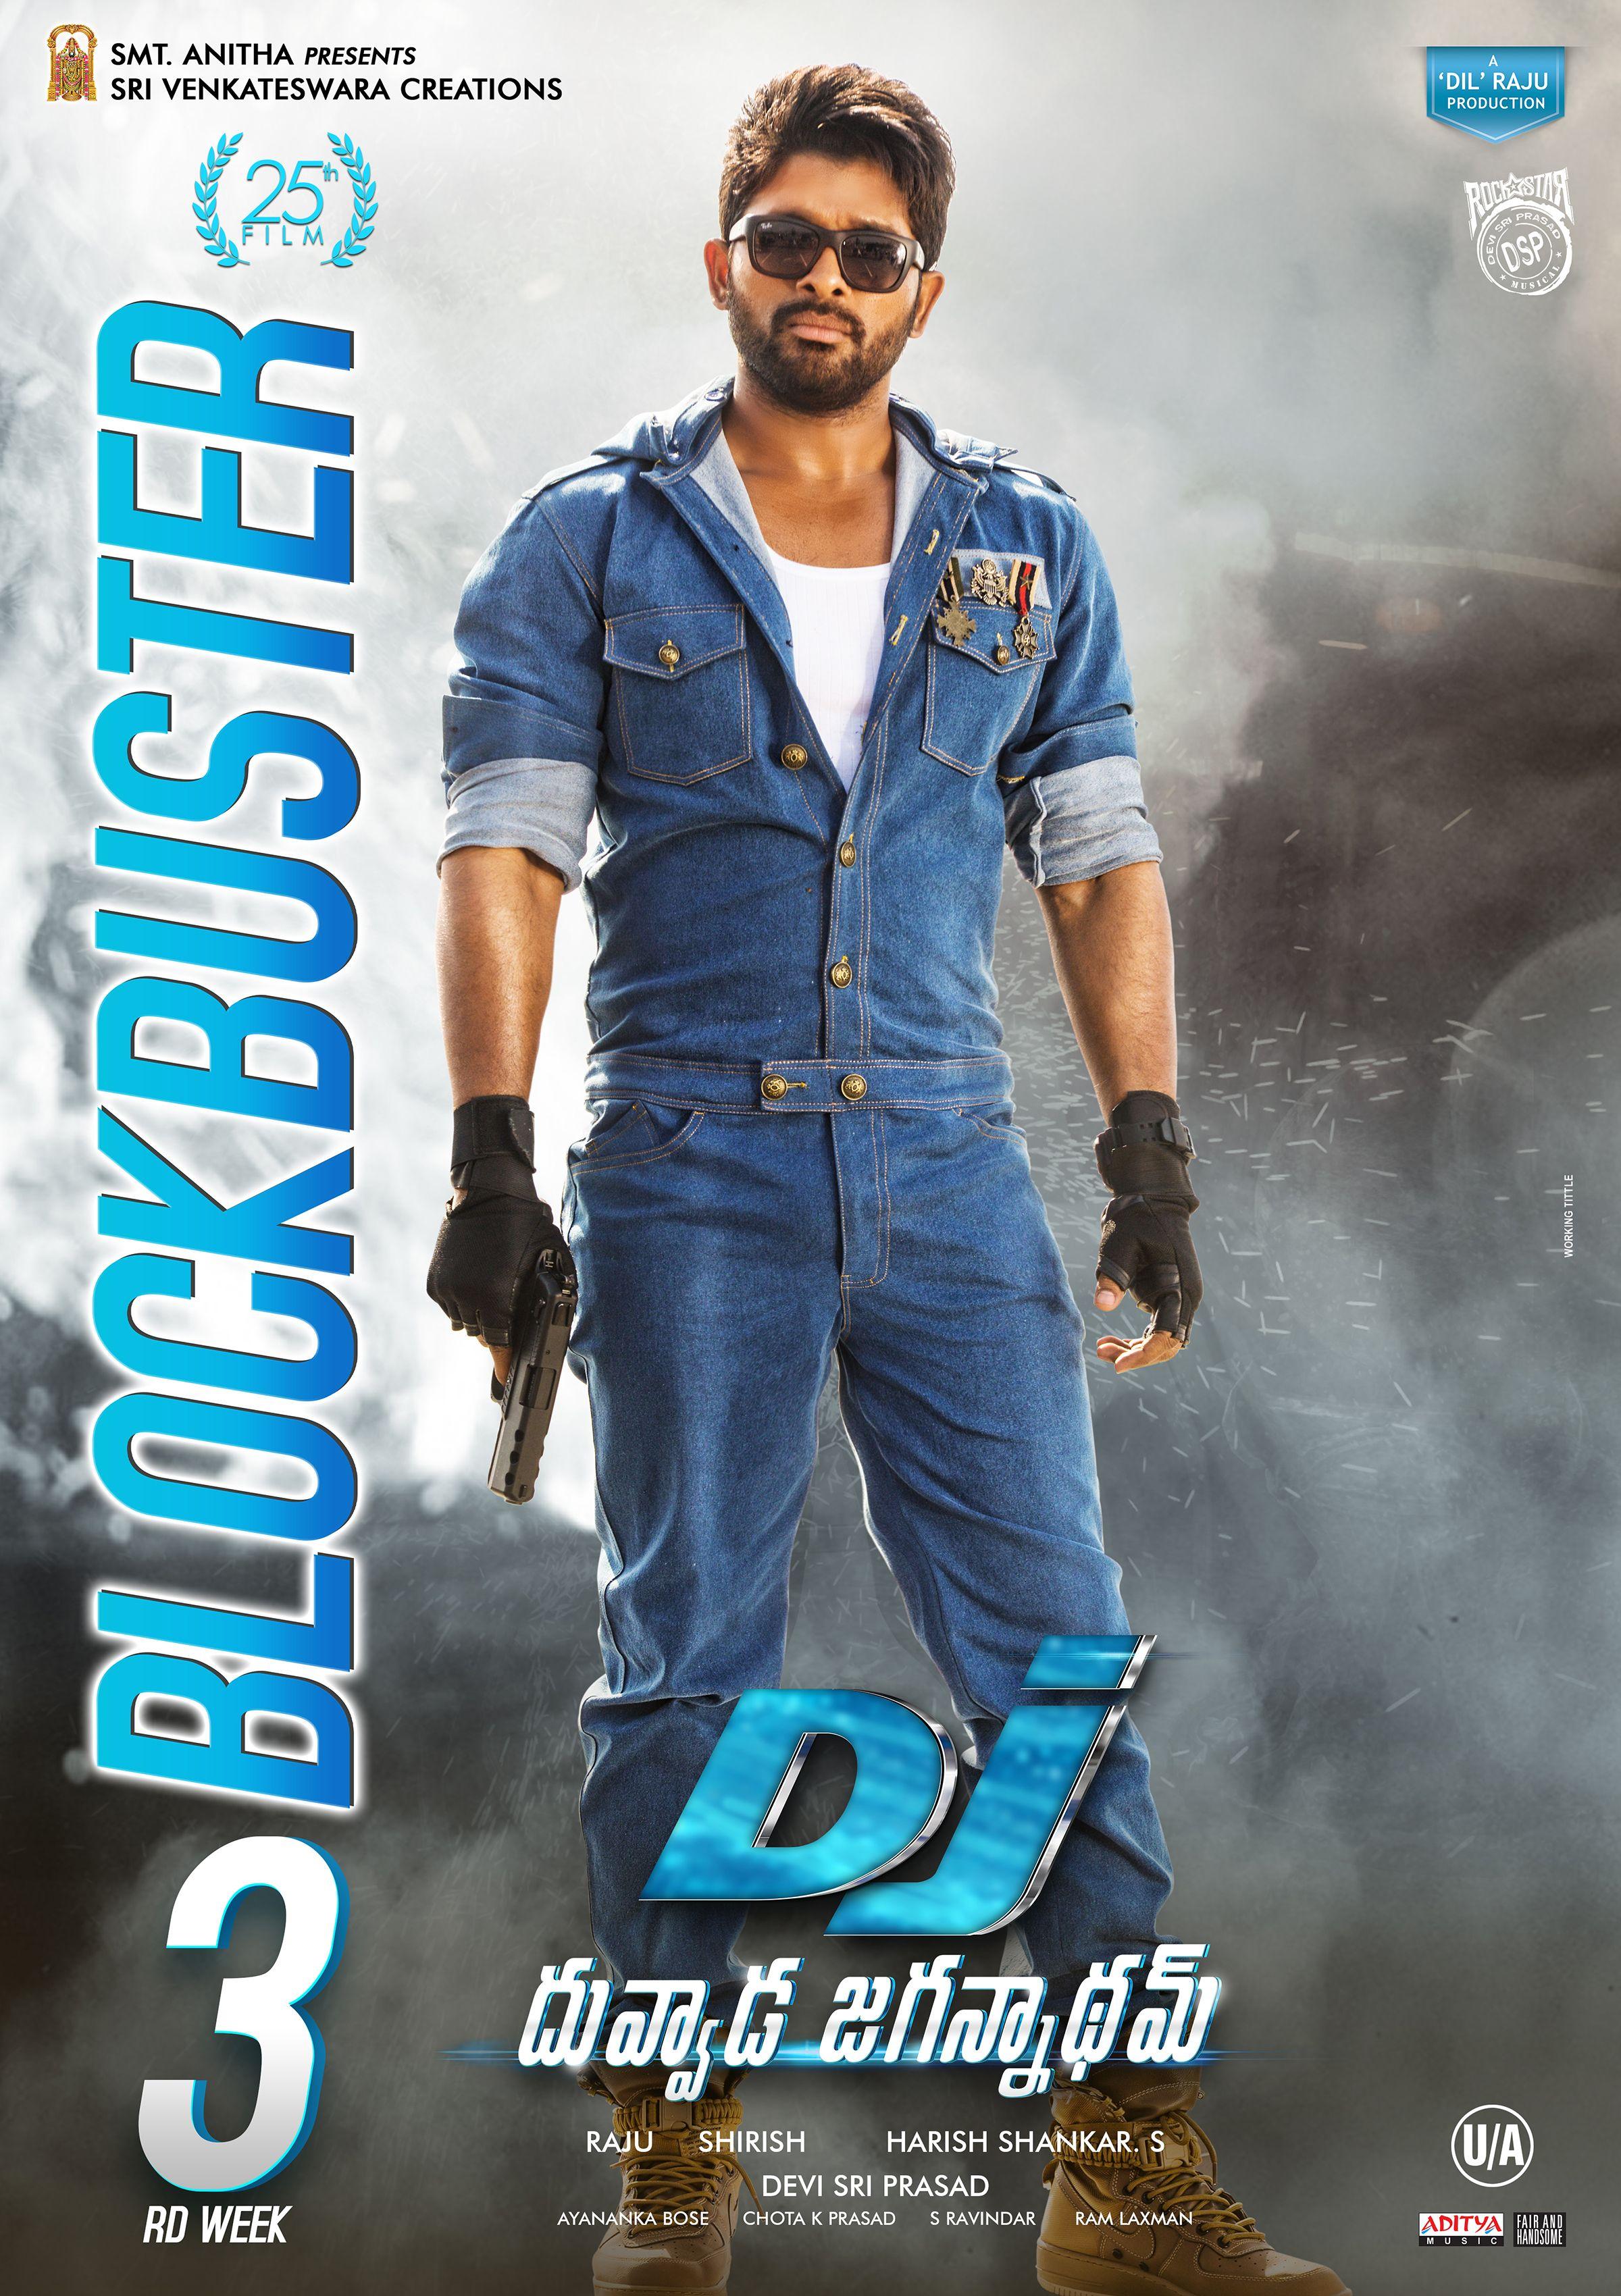 Allu Arjun Hindi Dubbed South Indian Movie Watch Now Dj